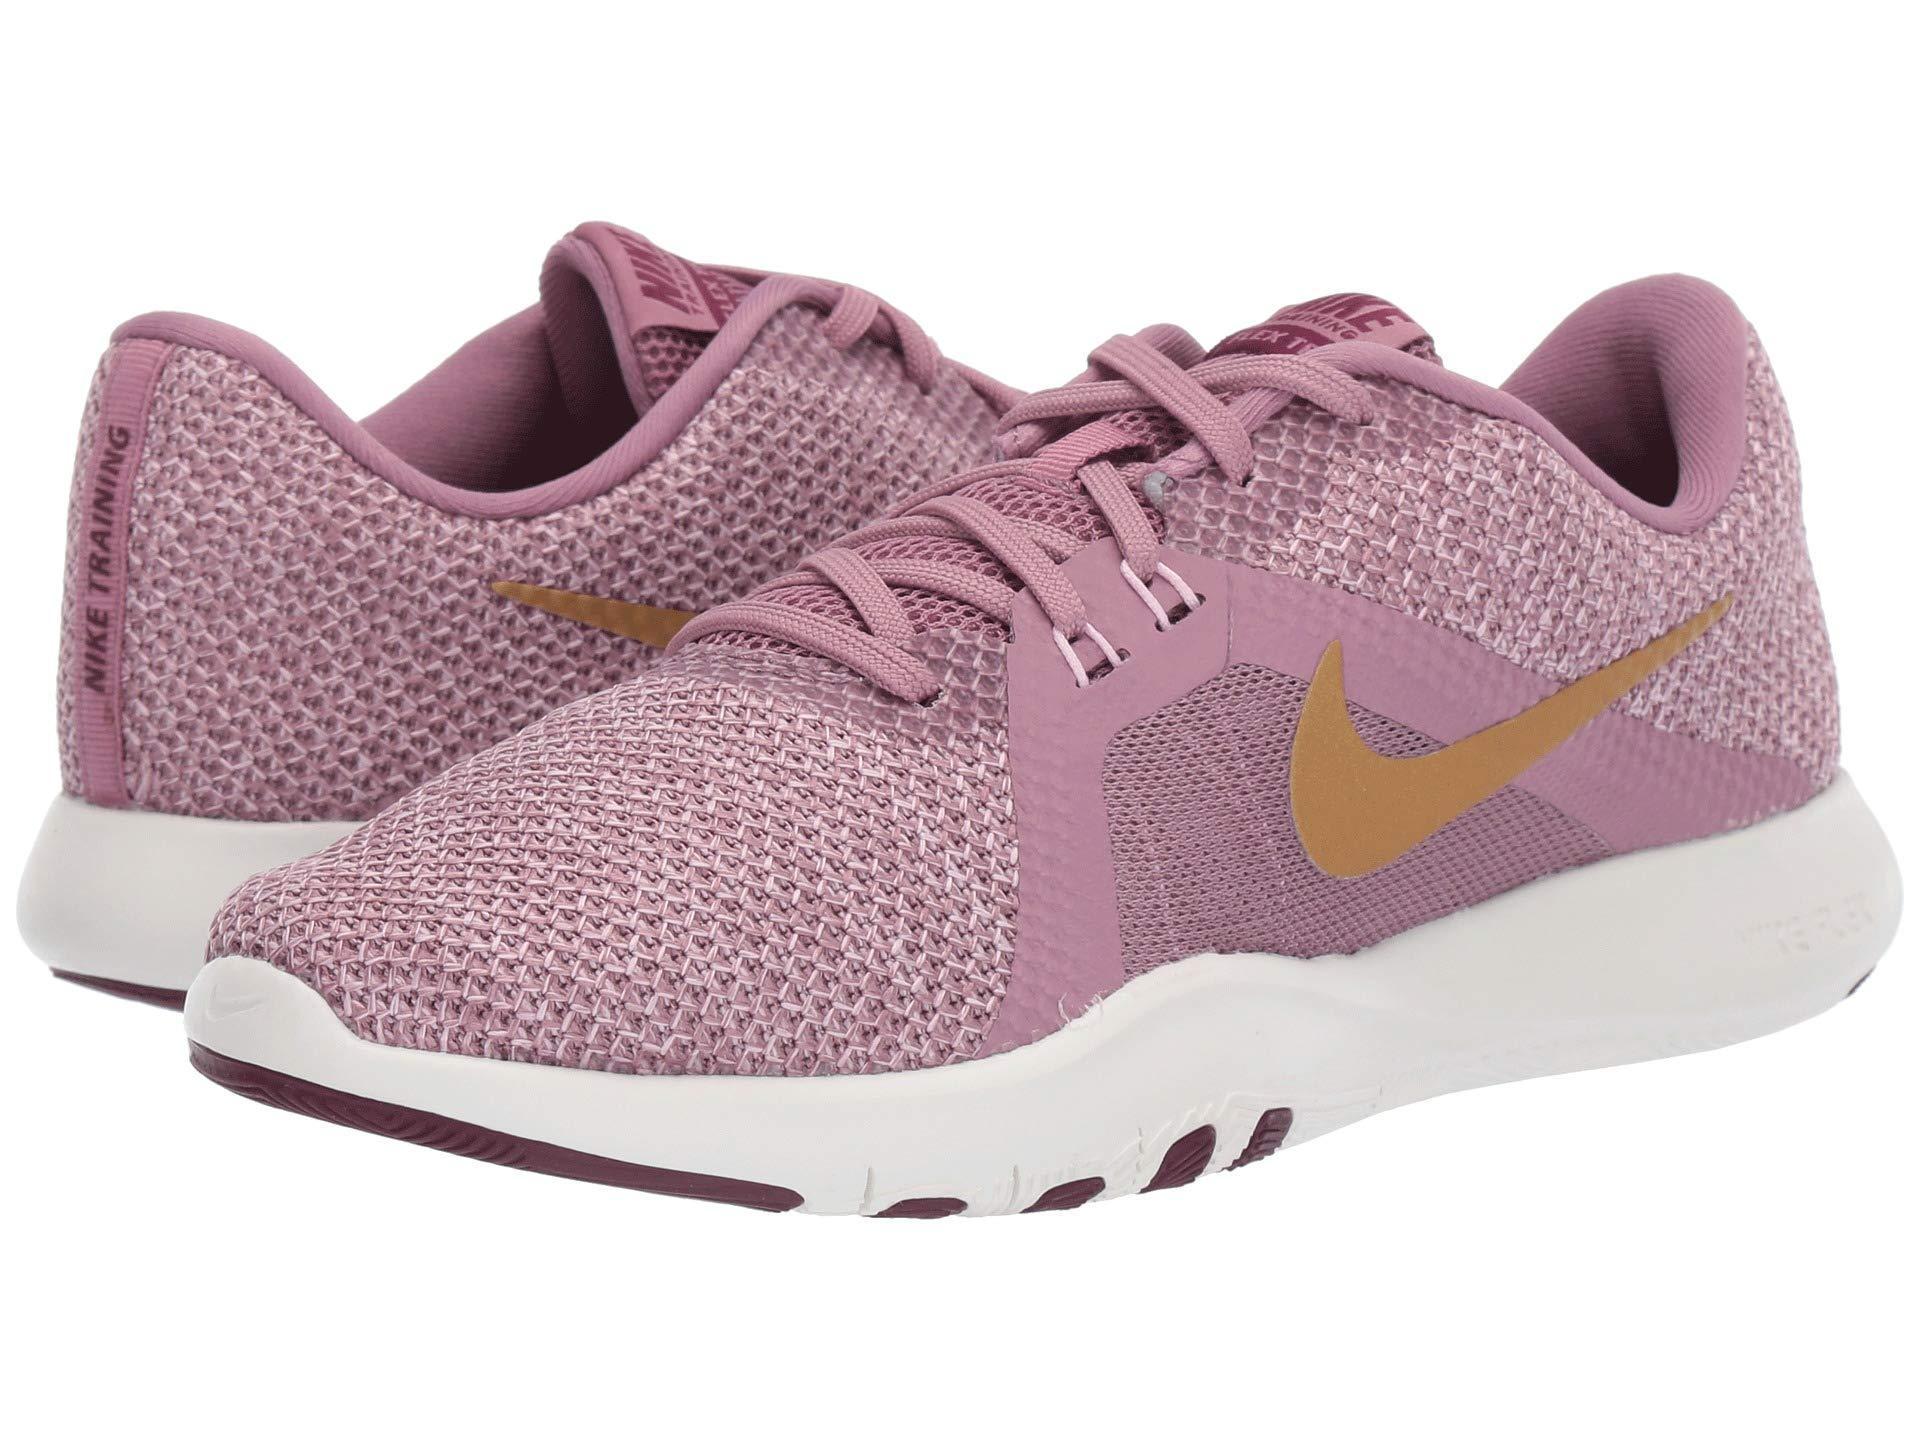 a6c178689b2f Nike. Flex Trainer 8 Amp (plum Dust metallic Element Gold pink Foam) Women s  Cross Training Shoes